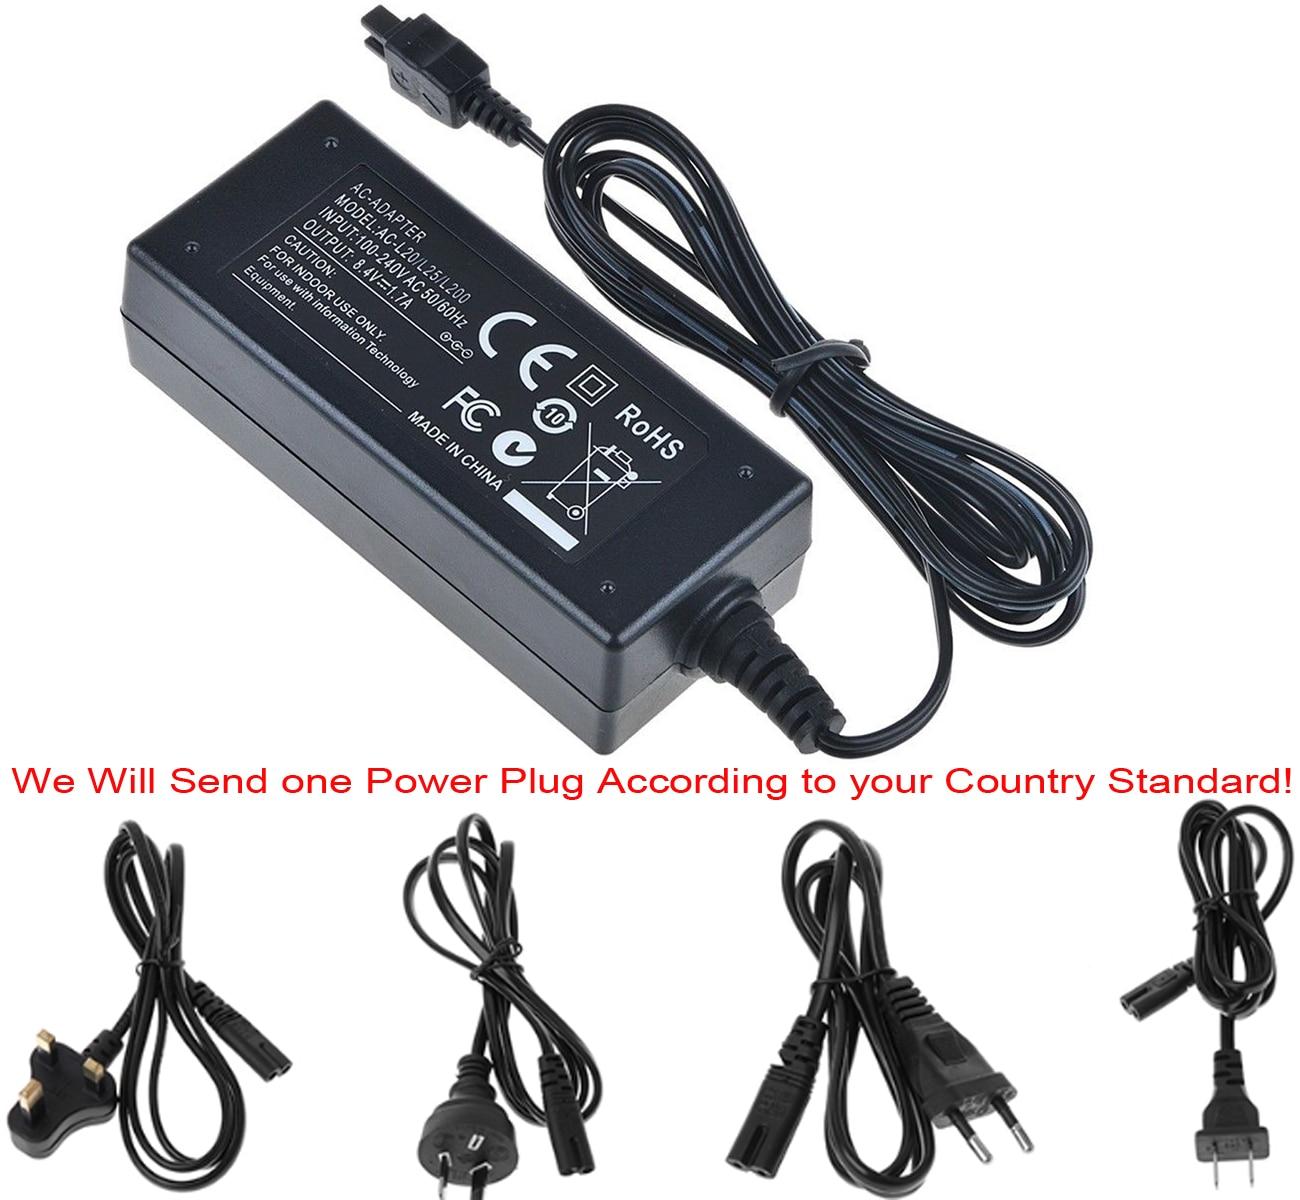 Cargador/adaptador de CA para videocámara Sony HDR-CX100, CX110, CX130, CX150, CX160, CX190,...